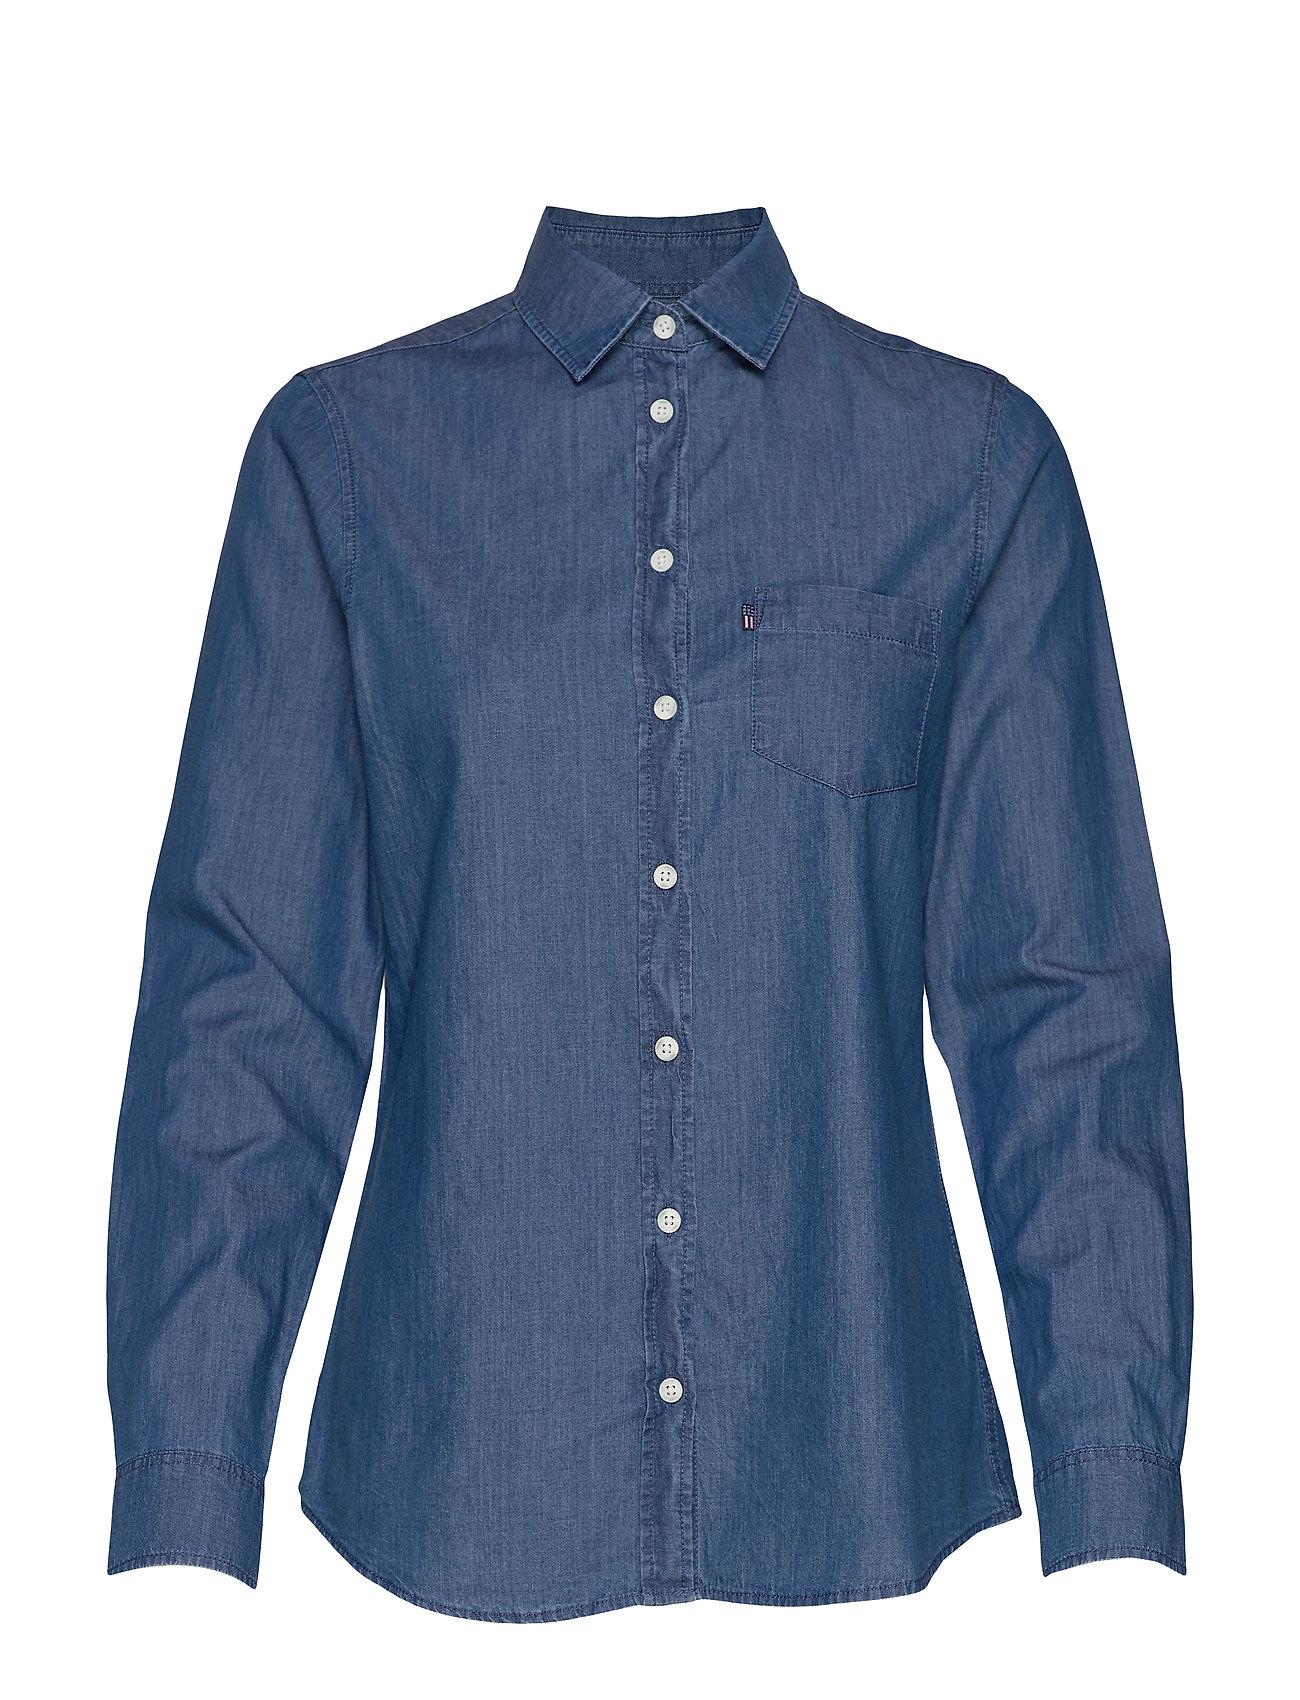 Lexington Clothing Emily Denim Shirt - MEDIUM BLUE DENIM